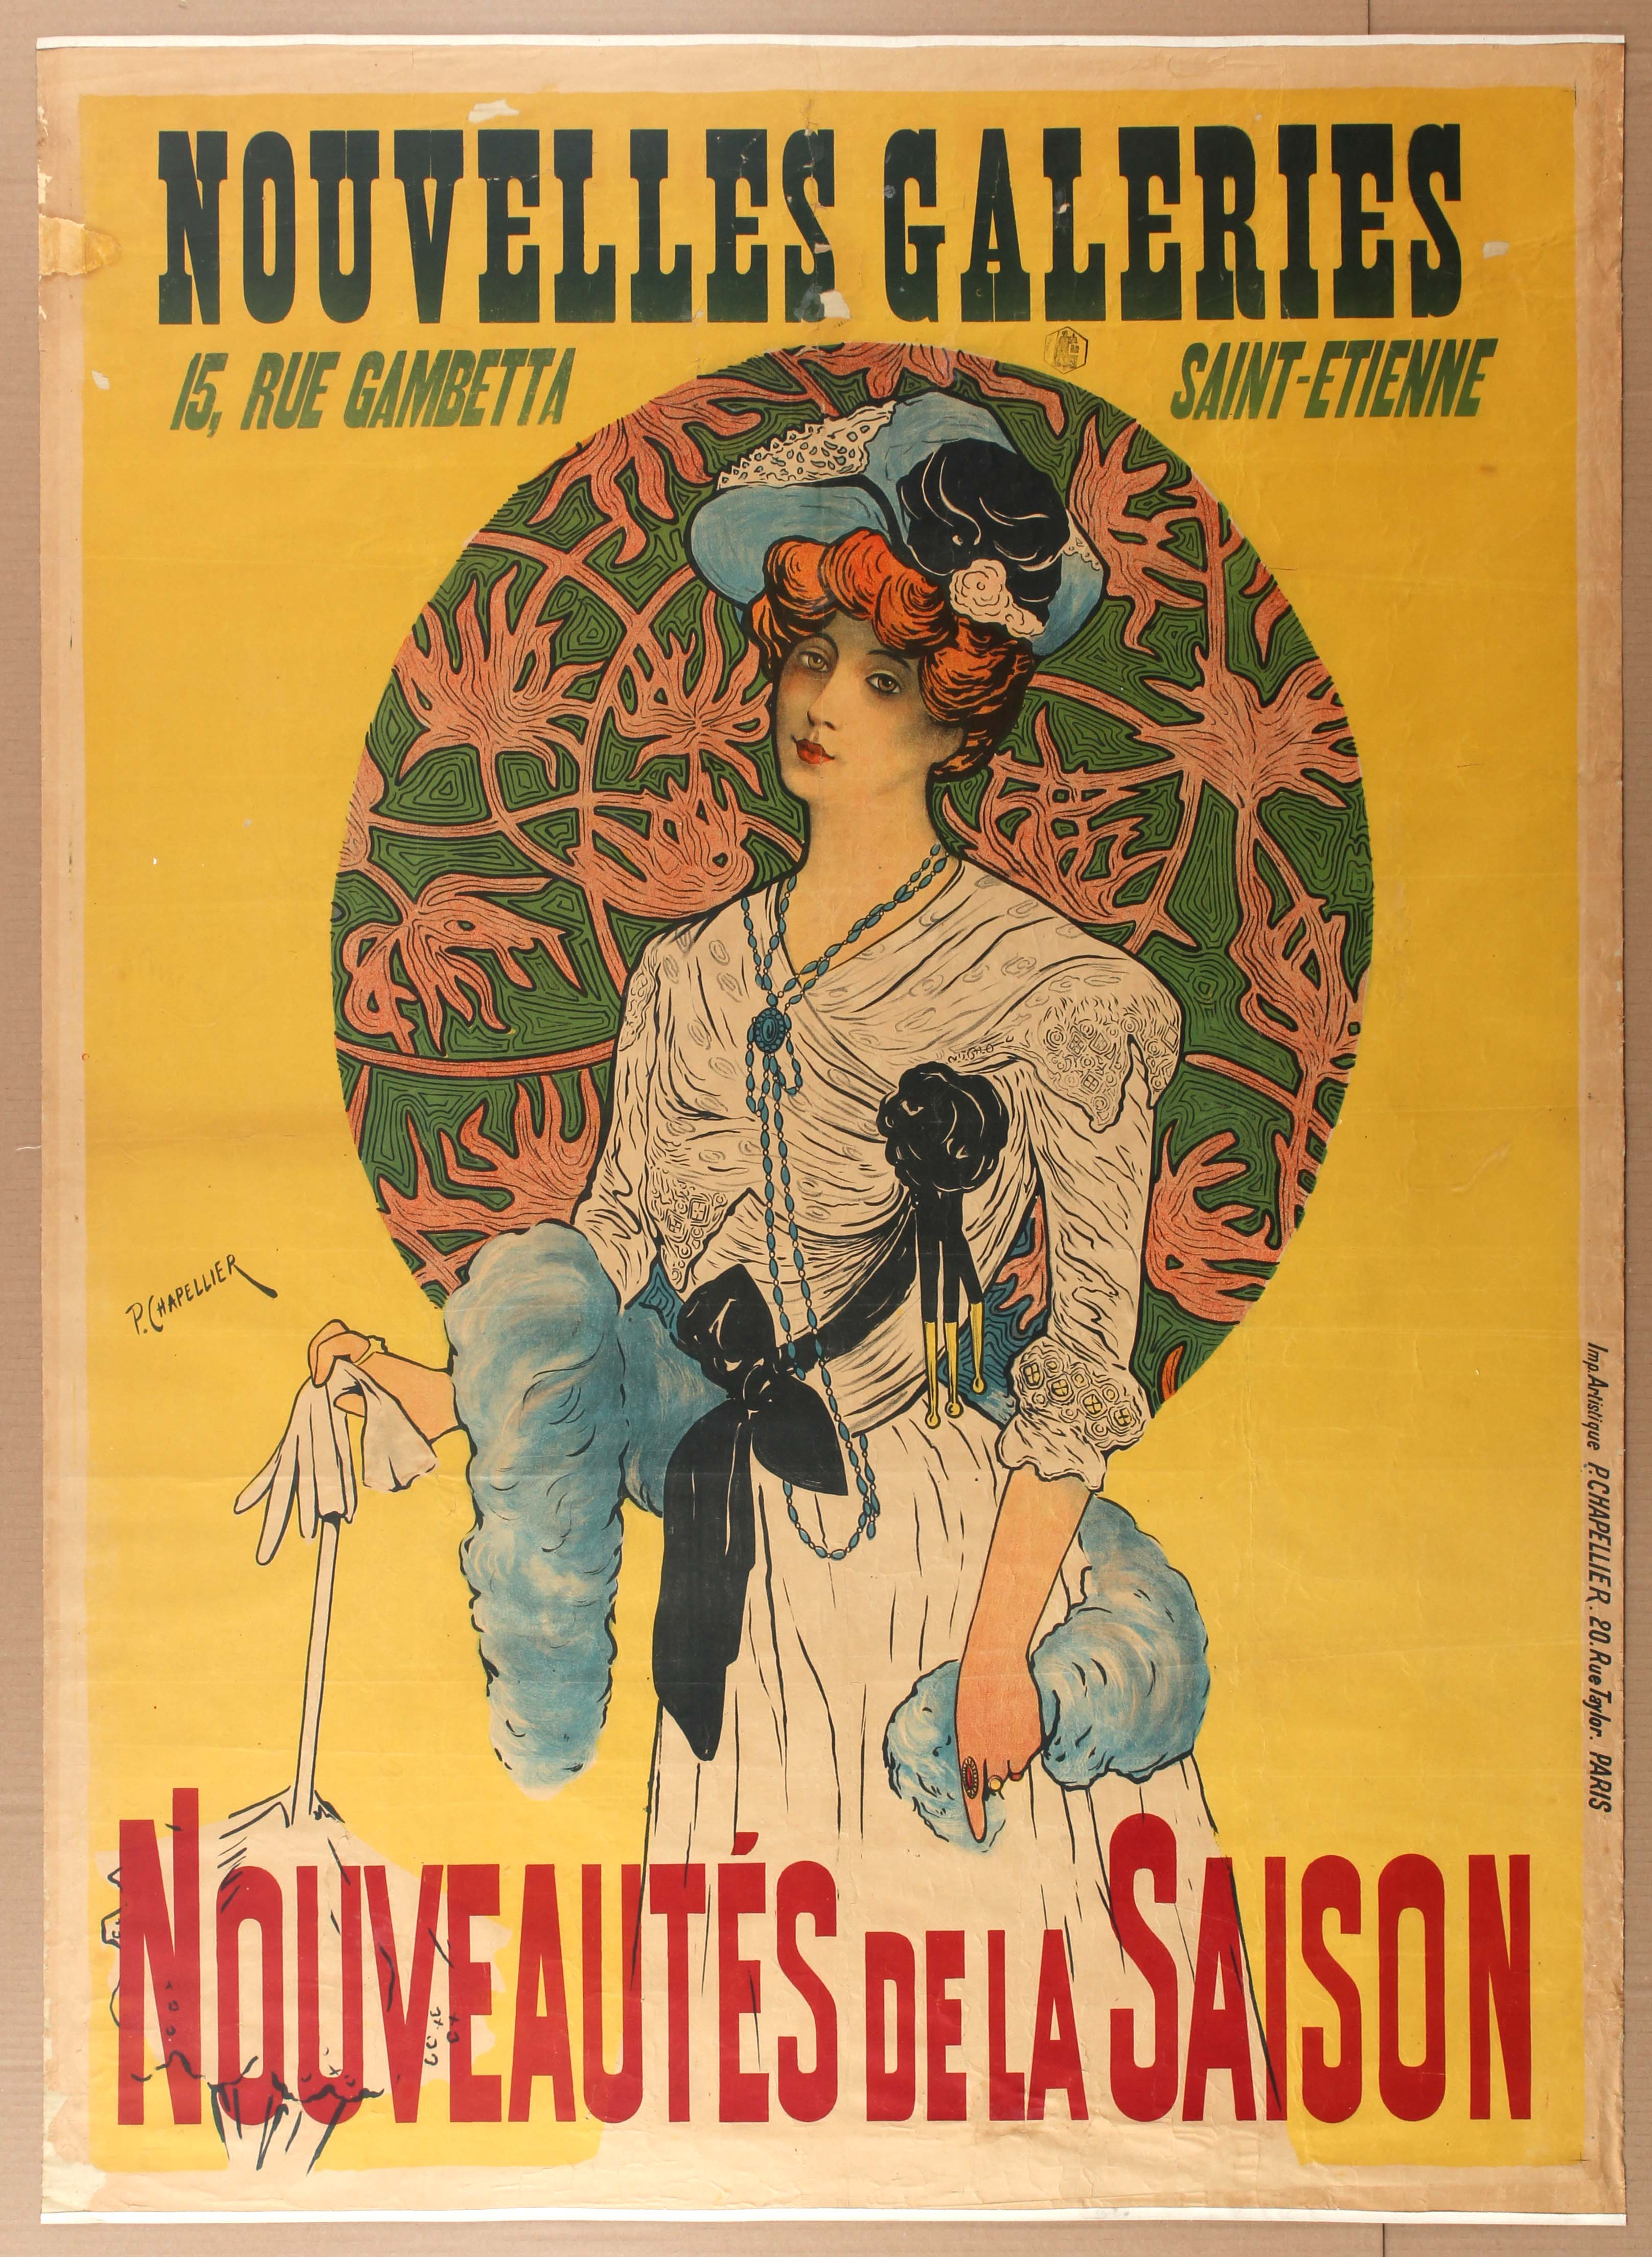 Lot 1017 - Advertising Poster Department France Belle Epoque